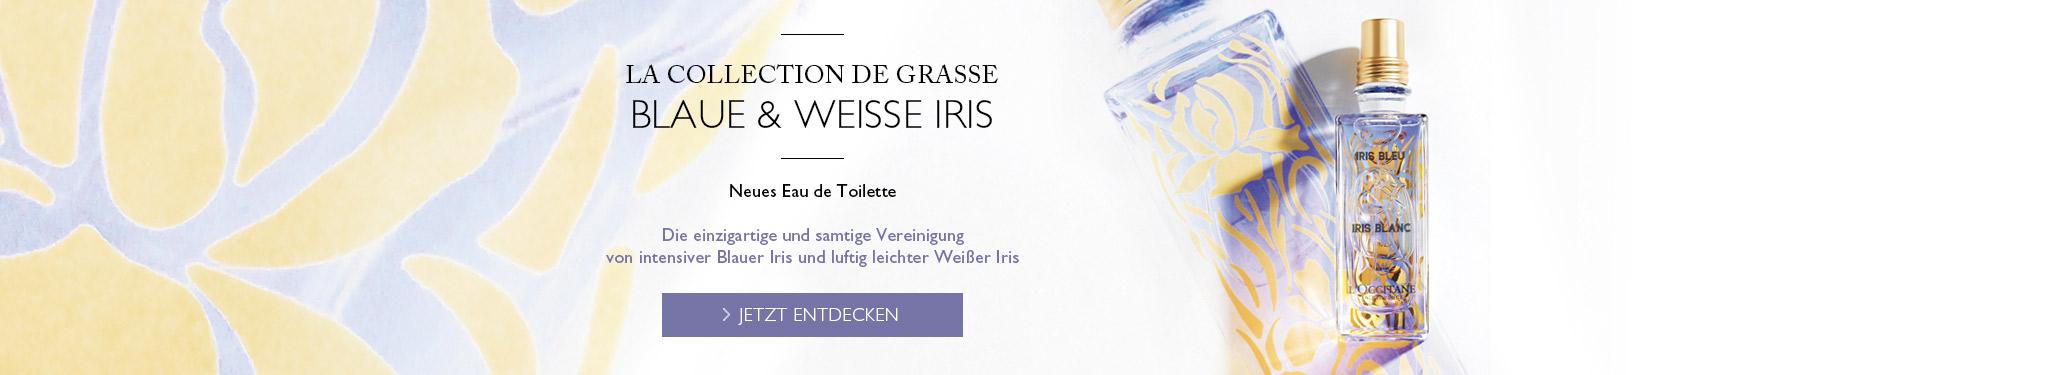 blaue weisse iris